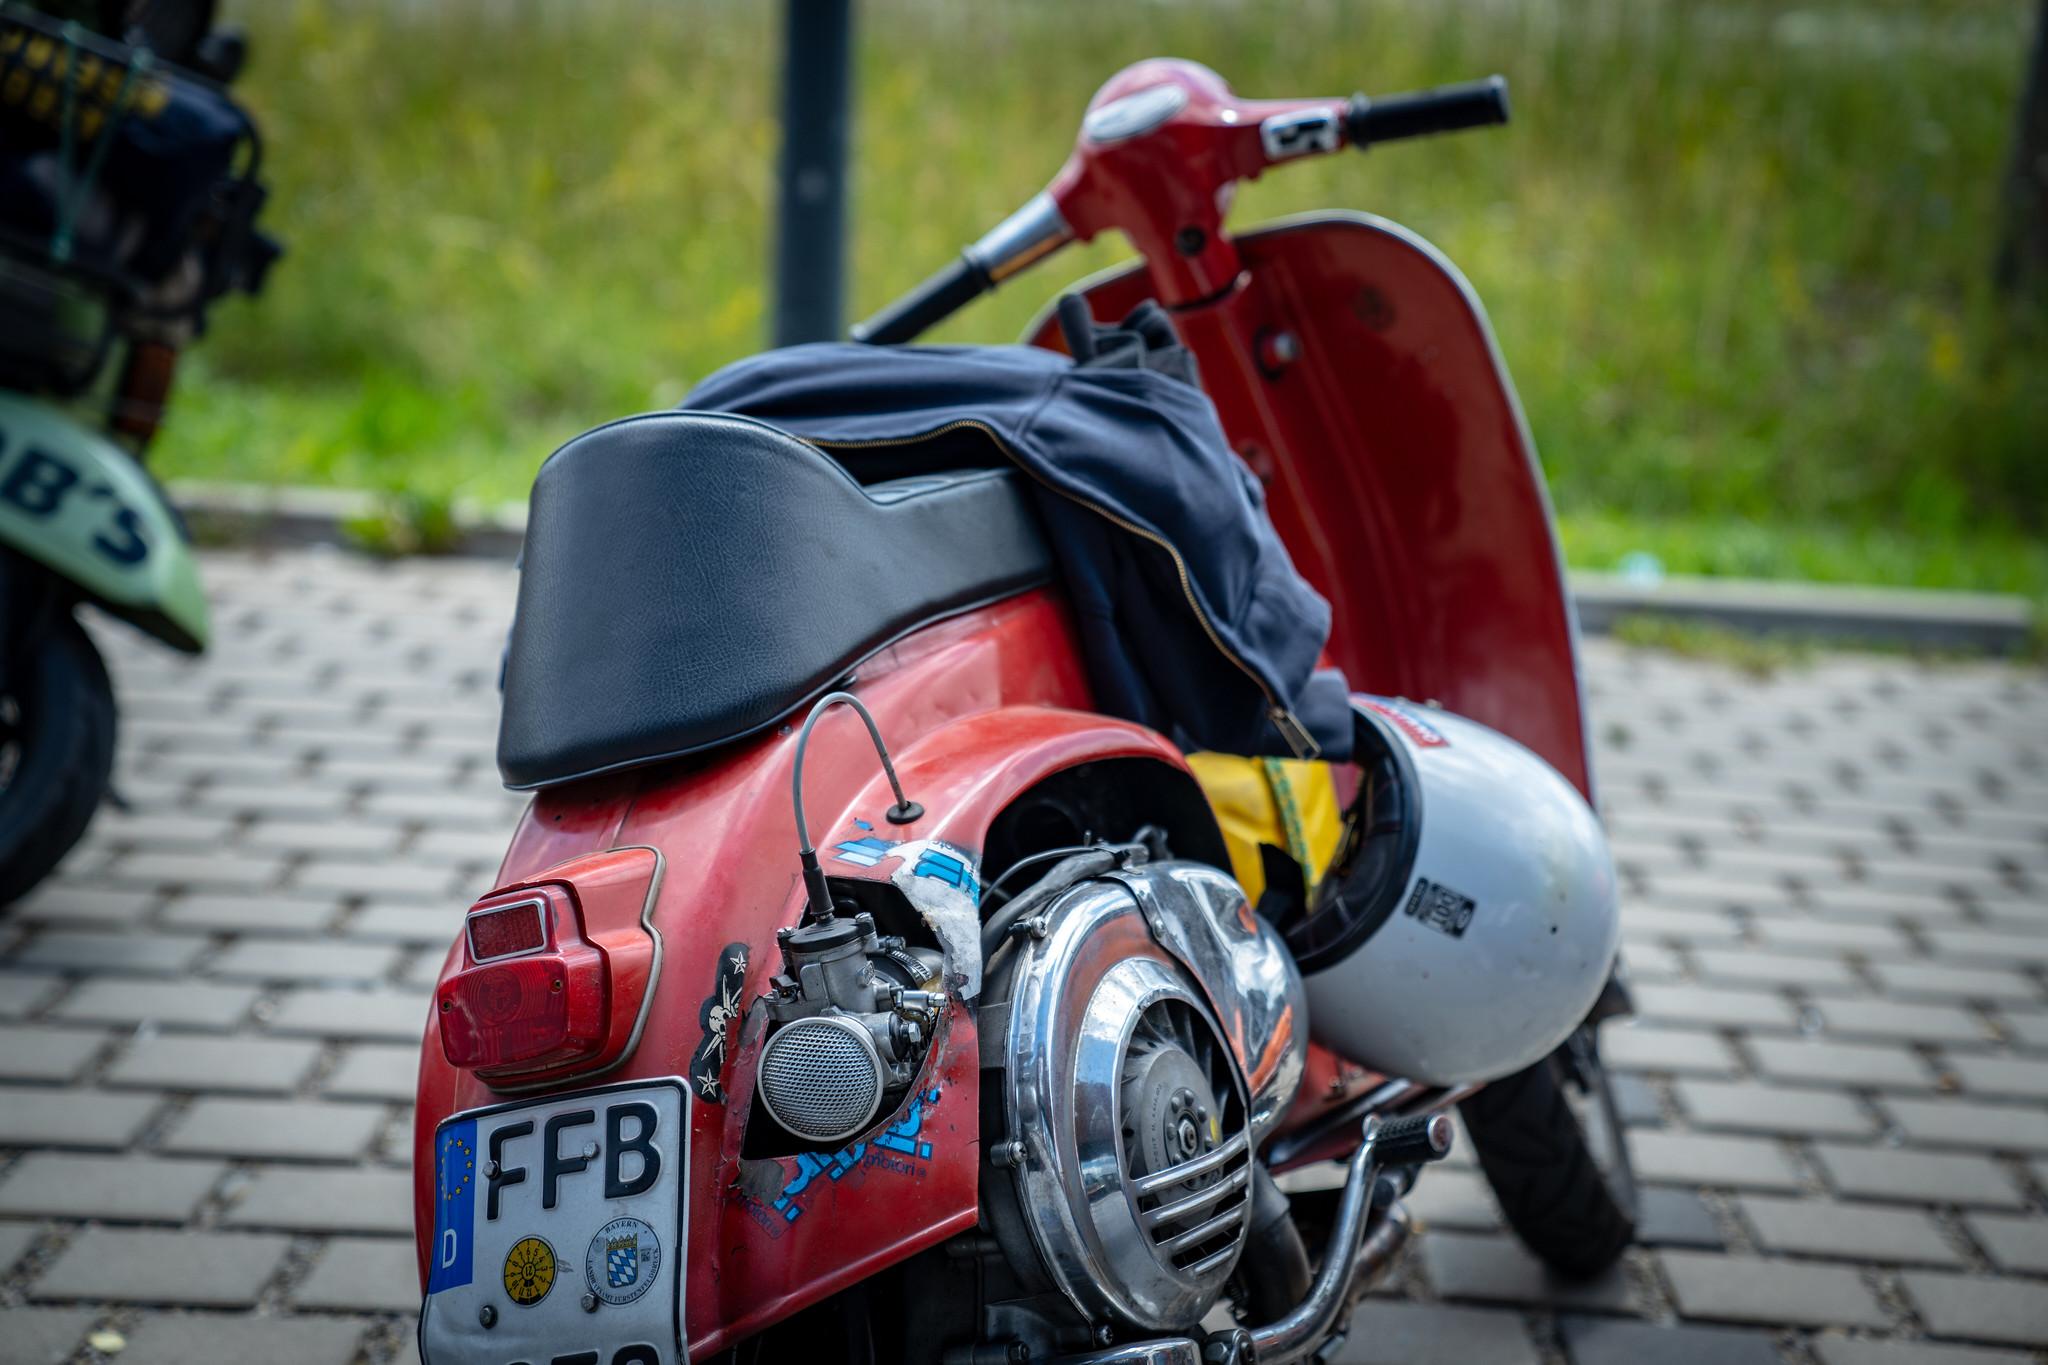 SIP Joyride Juli 2020 - Enjoy Riding